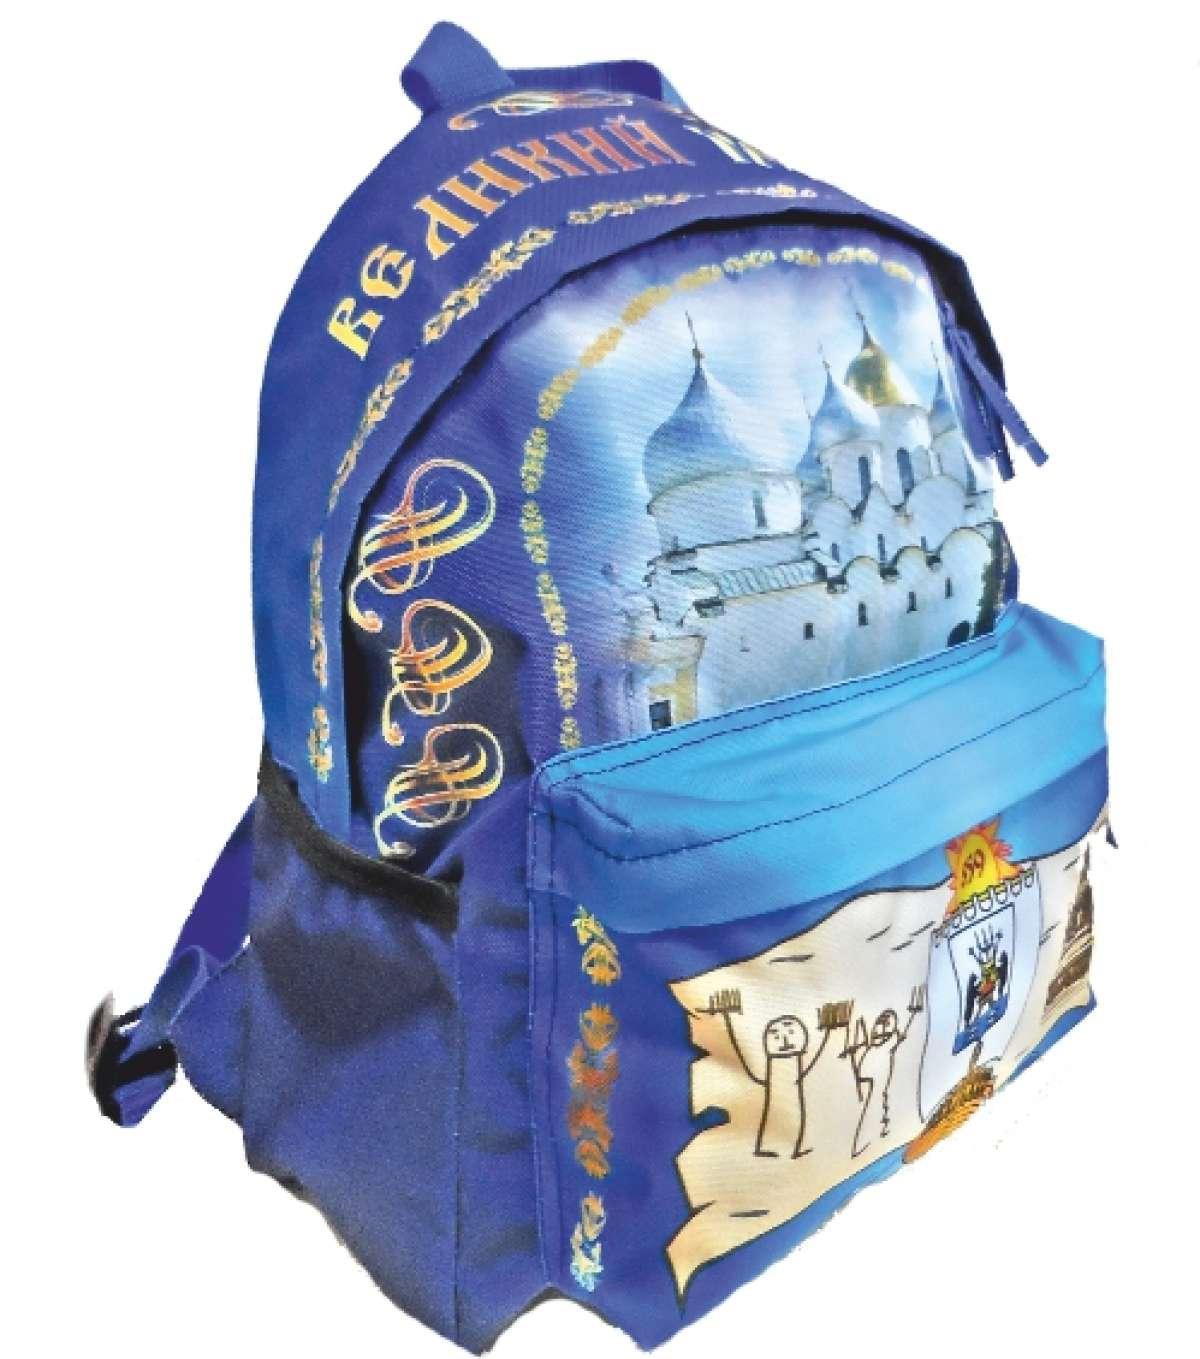 Новая услуга от S.A.L bags: ваше «Я» на нашей сумке